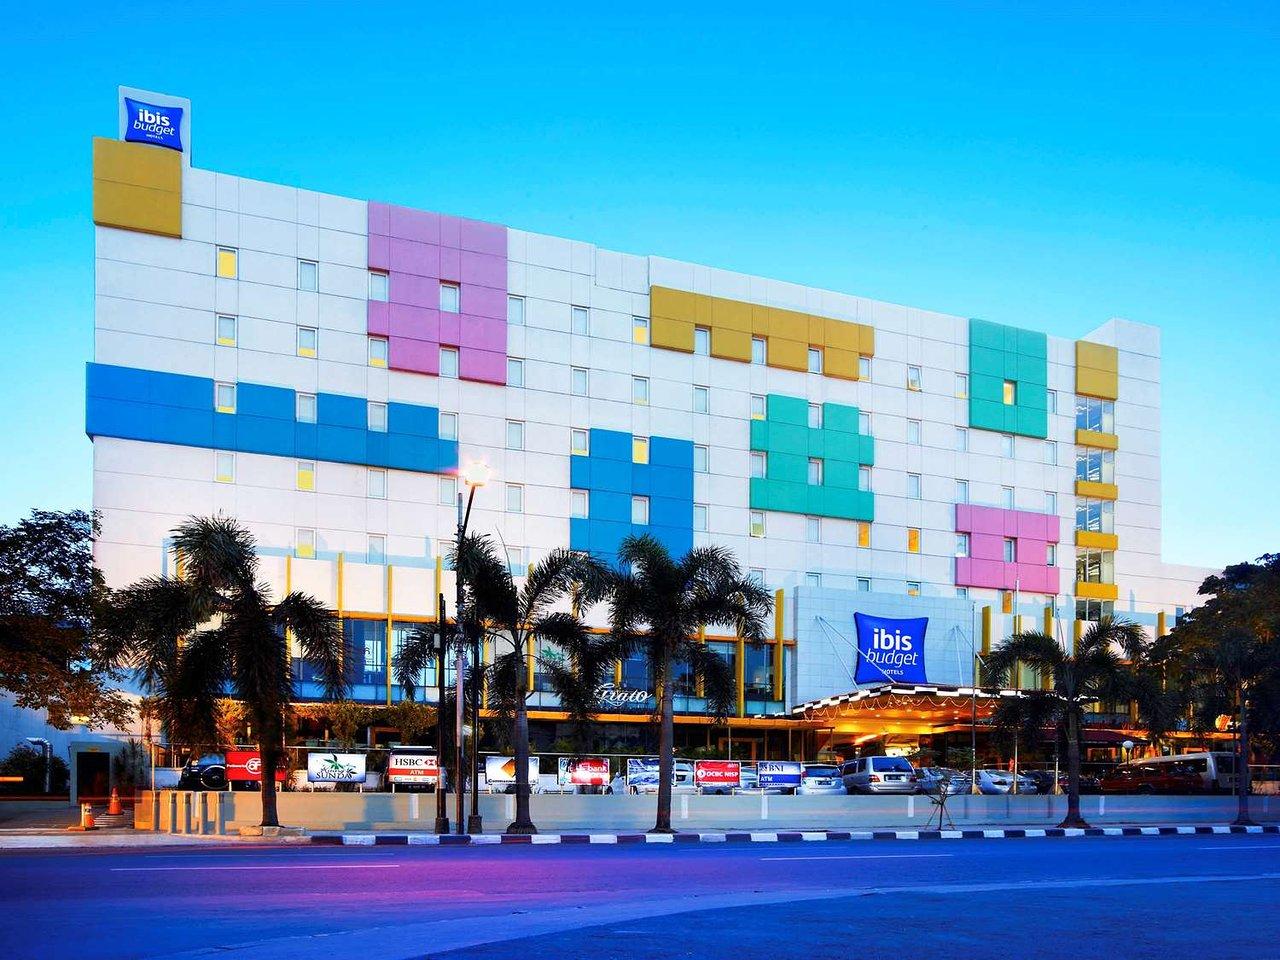 ibis budget jakarta cikini updated 2019 prices hotel reviews rh tripadvisor com